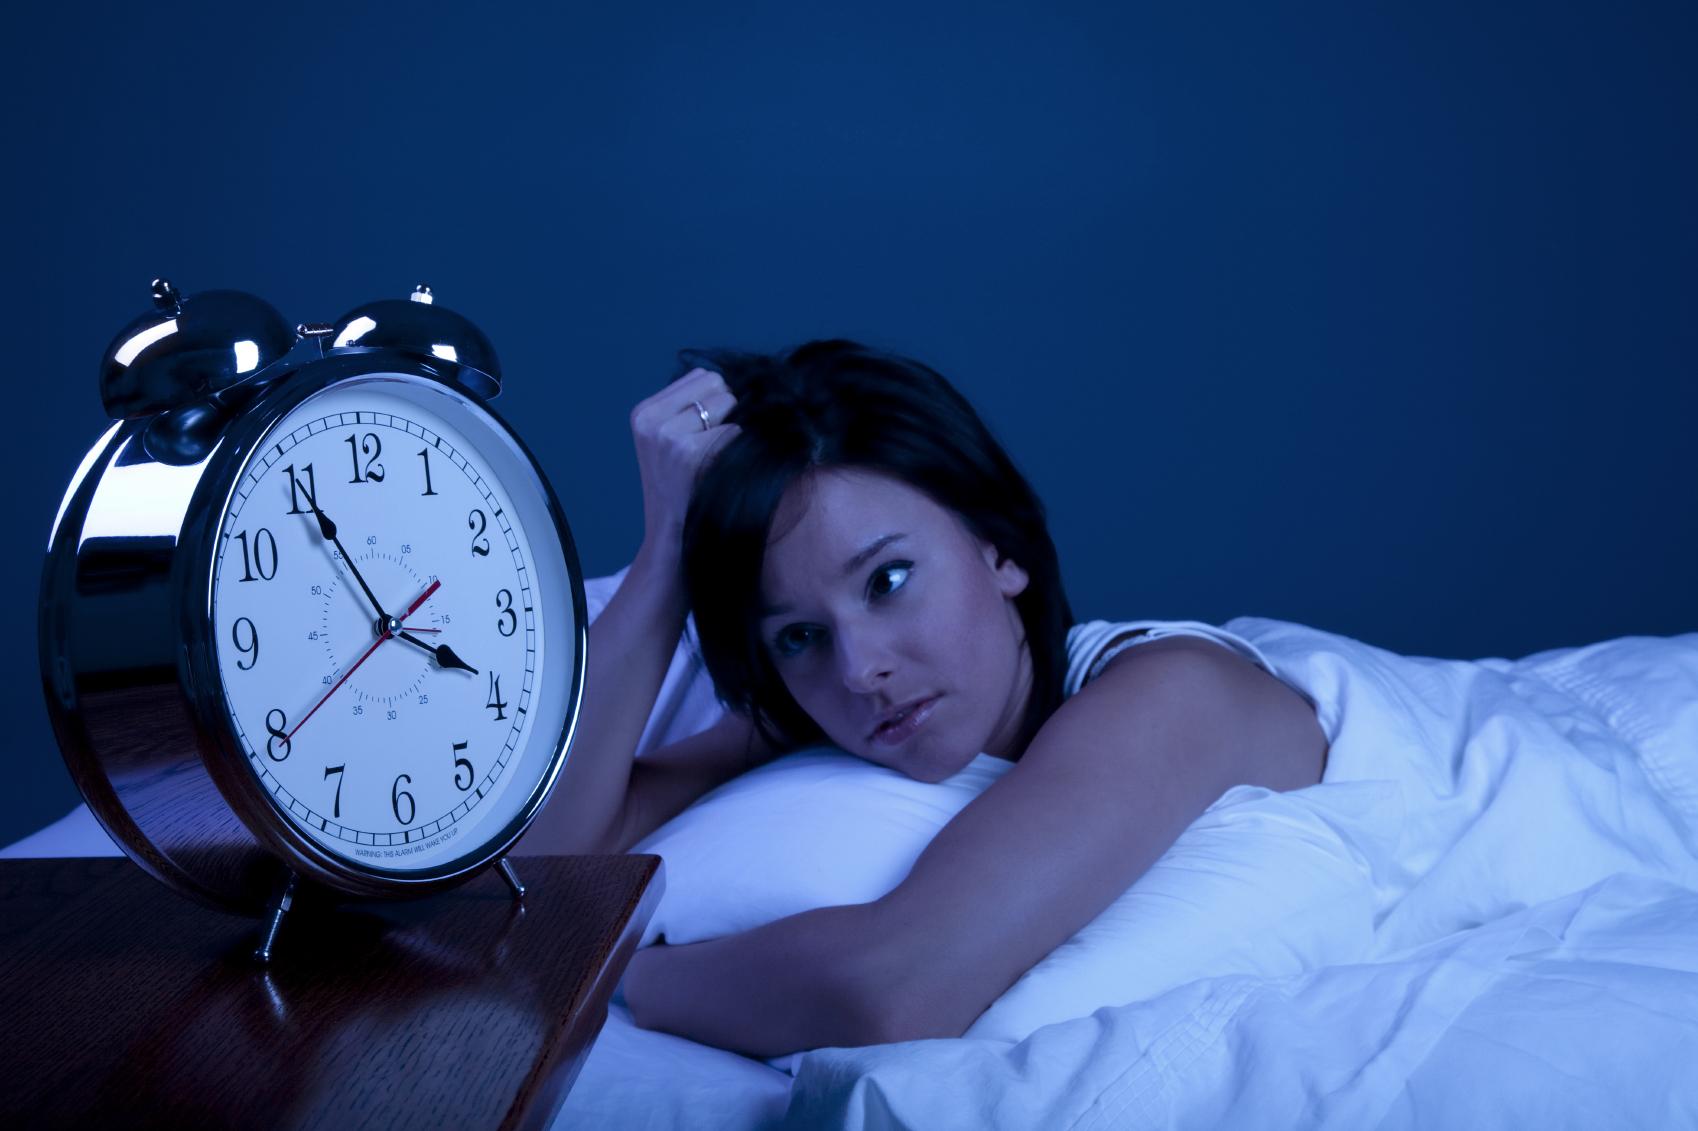 Нарушение сна лечение методами физиотерапии